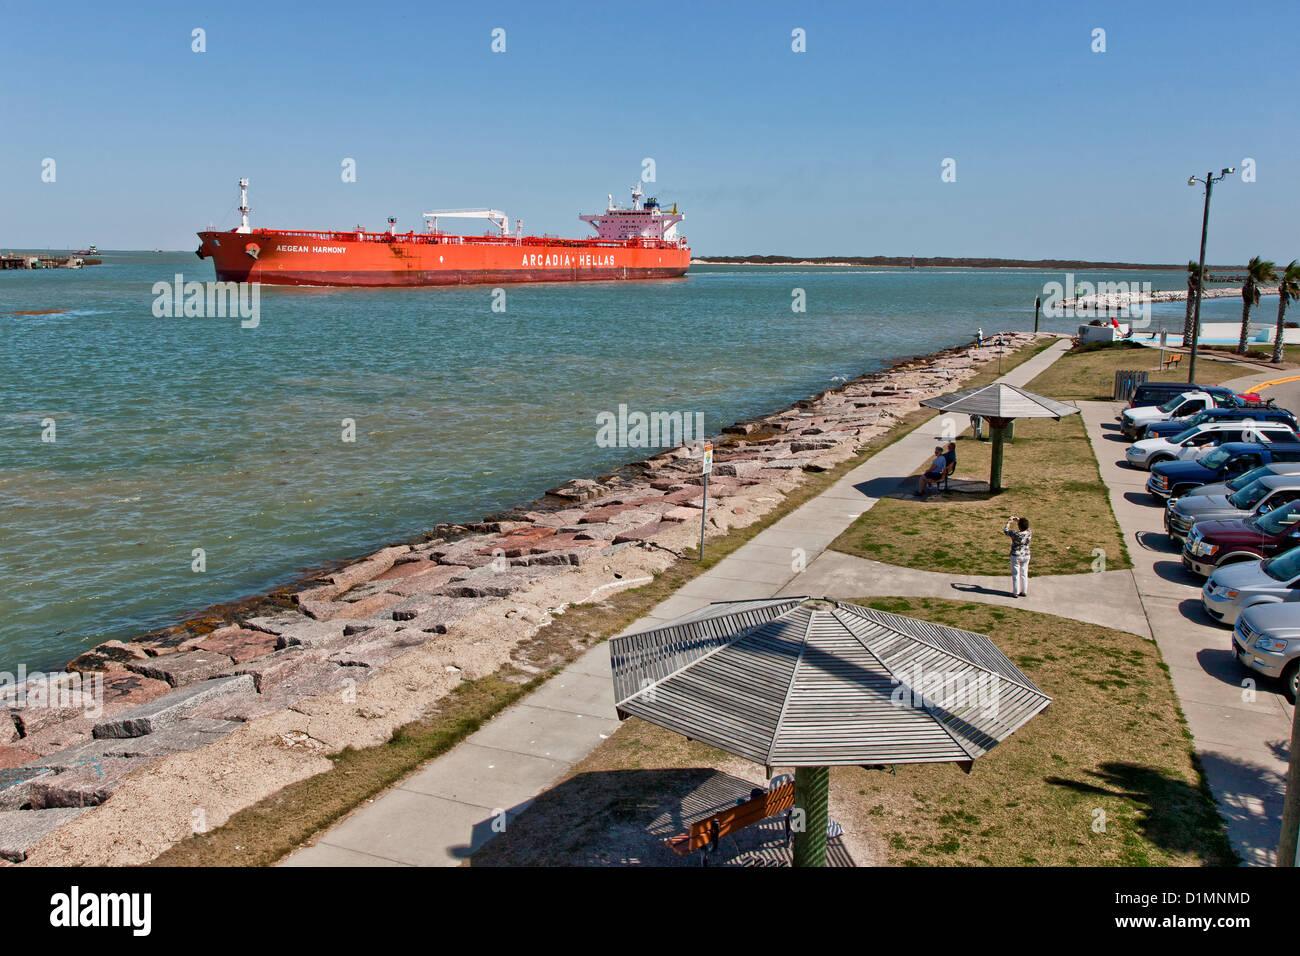 Tanker transporting petroleum, Corpus Christi ship channel. - Stock Image